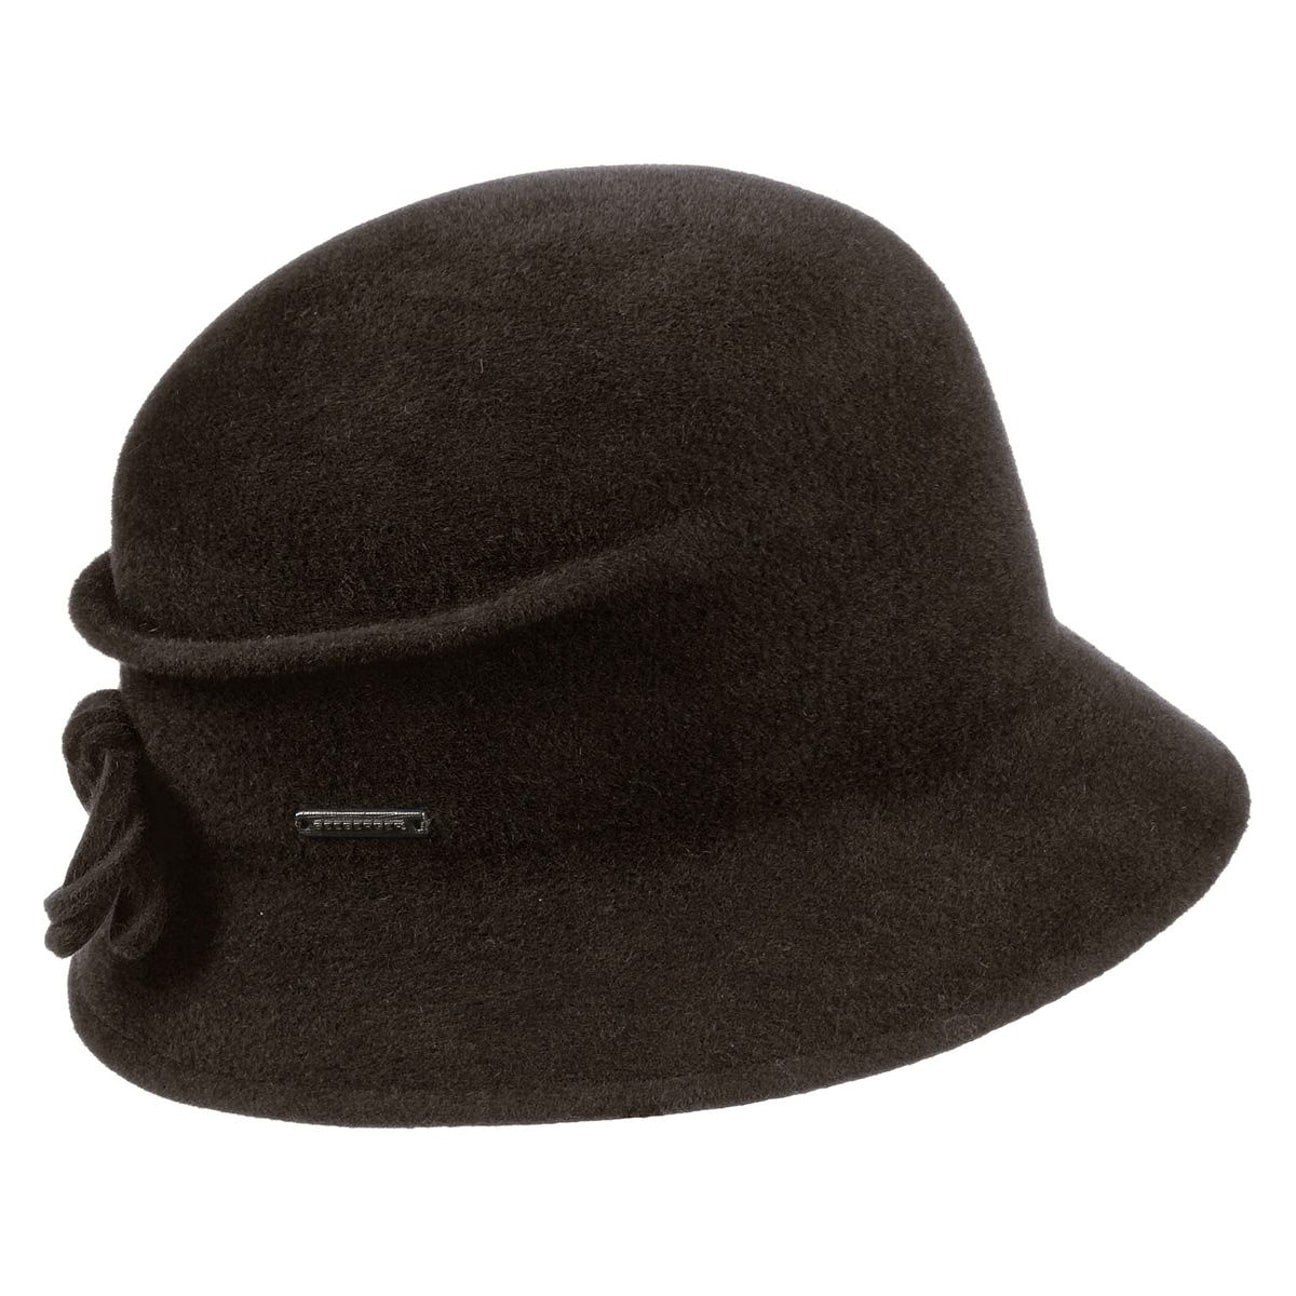 a499448933e ... Sabrina Velours Cloche Hat by Seeberger - dark brown 1 ...